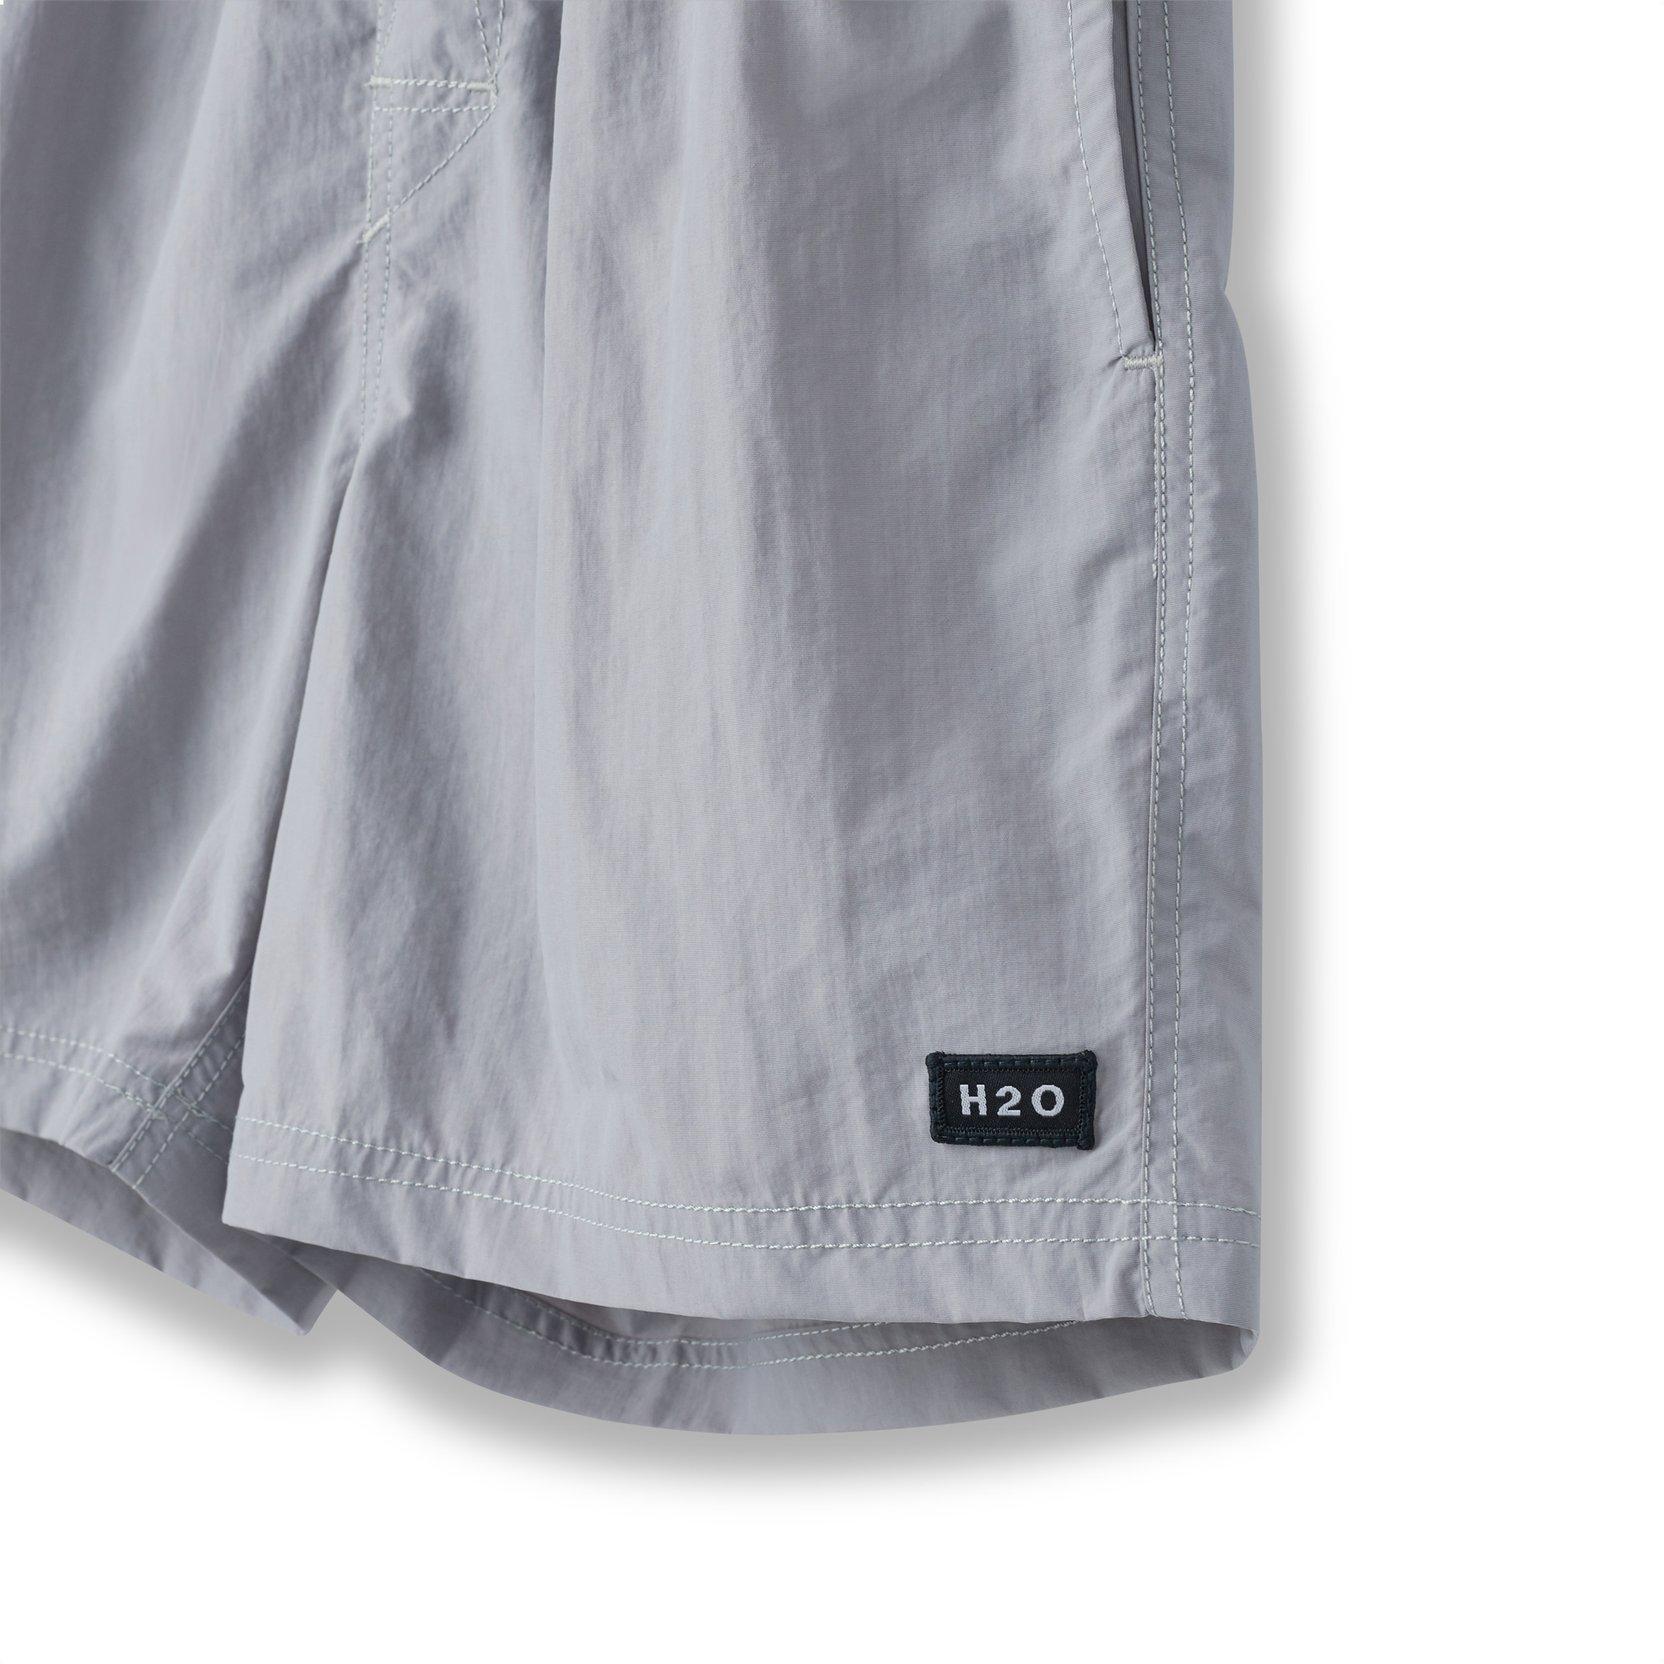 H2O Leisure badeshorts, dusty grey, x-small